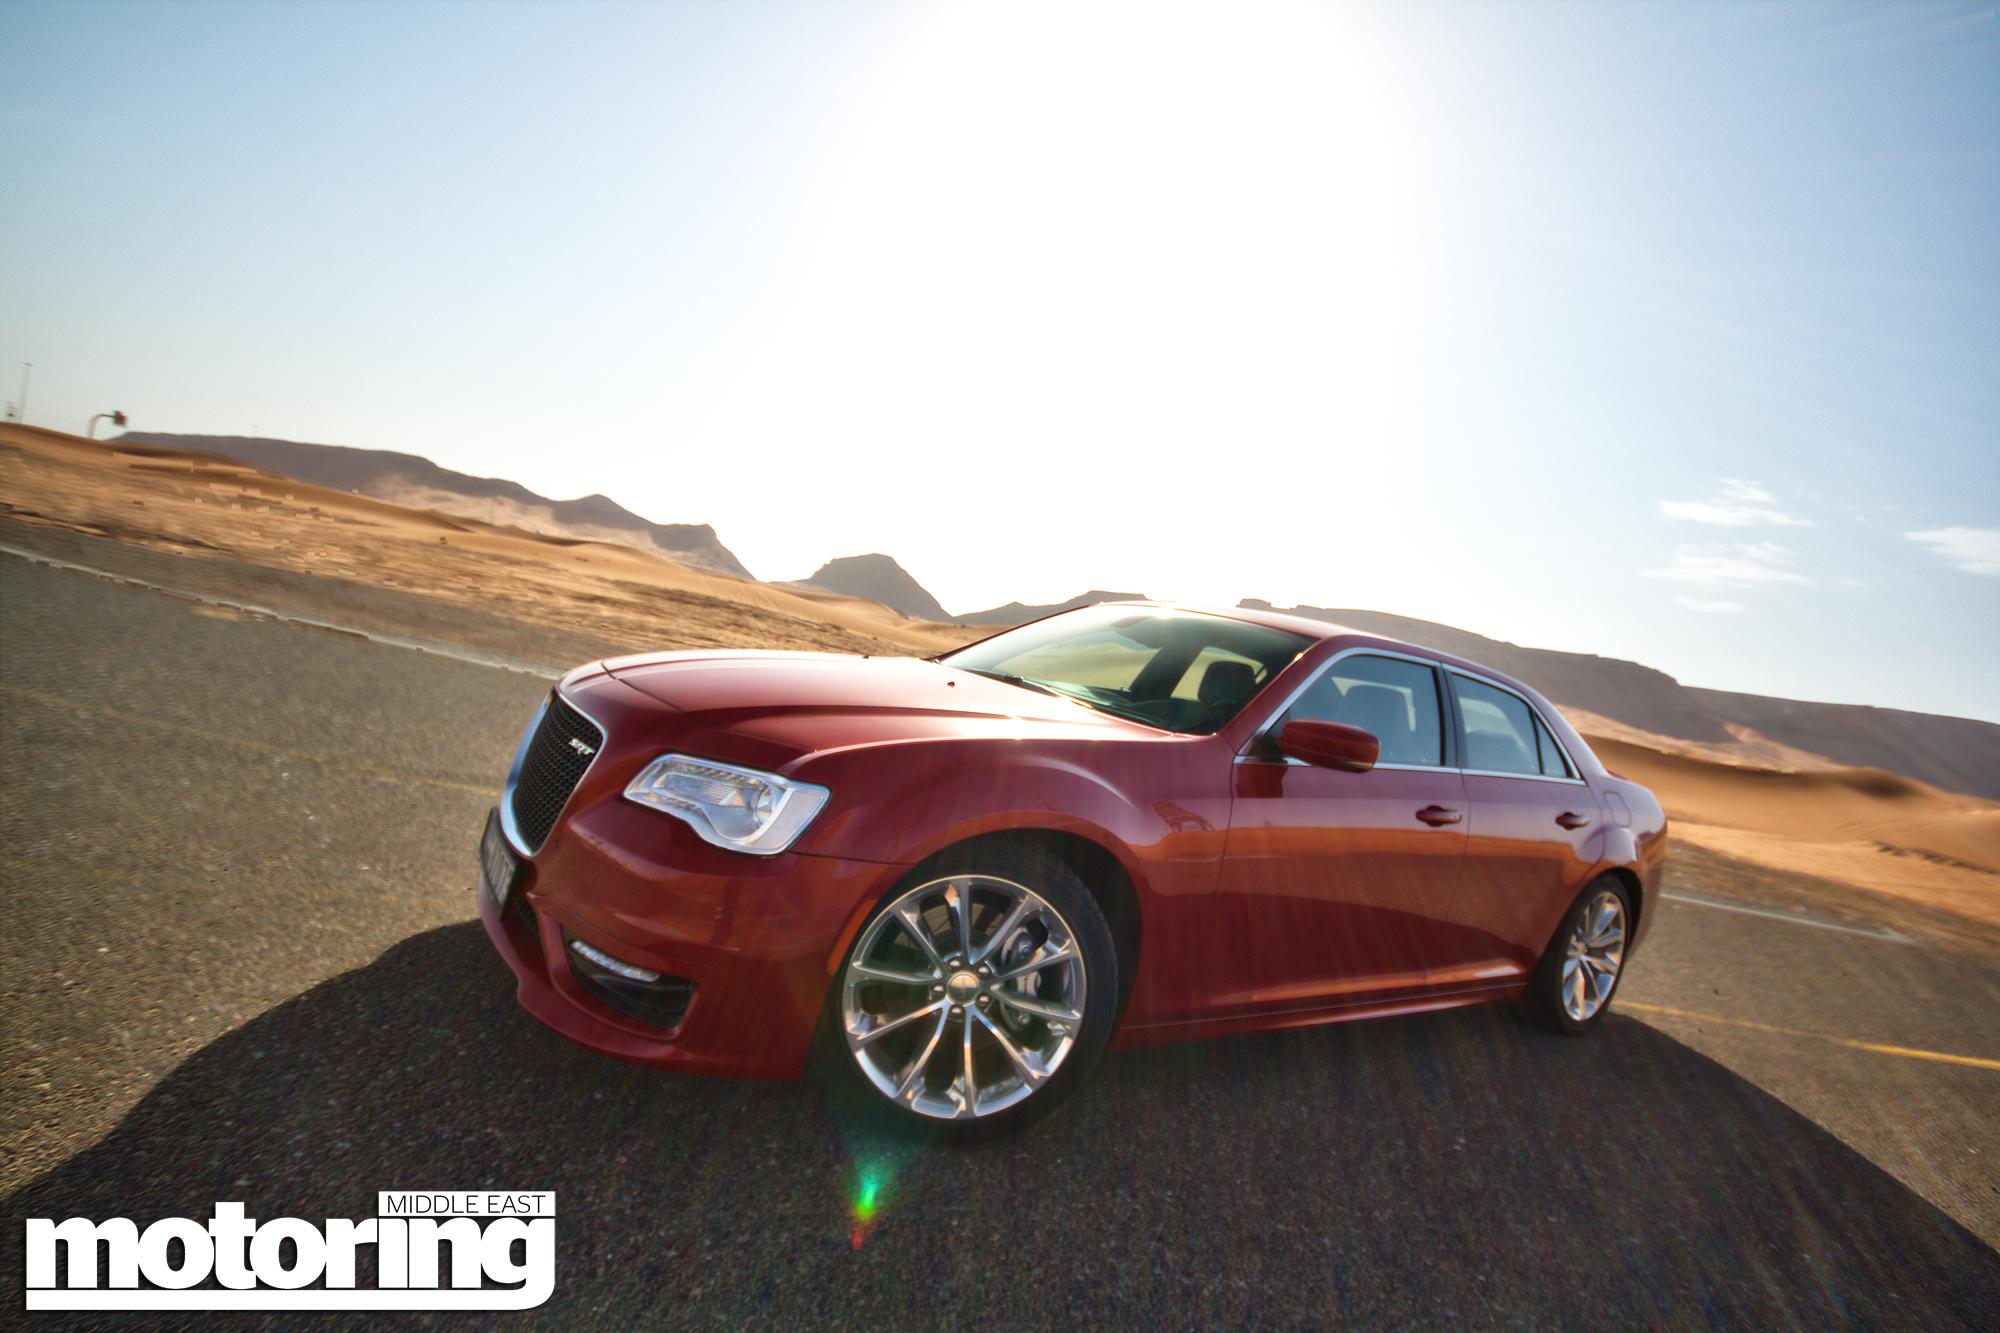 2015 Chrysler 300C SRT8 Middle East video reviewMotoring Middle East